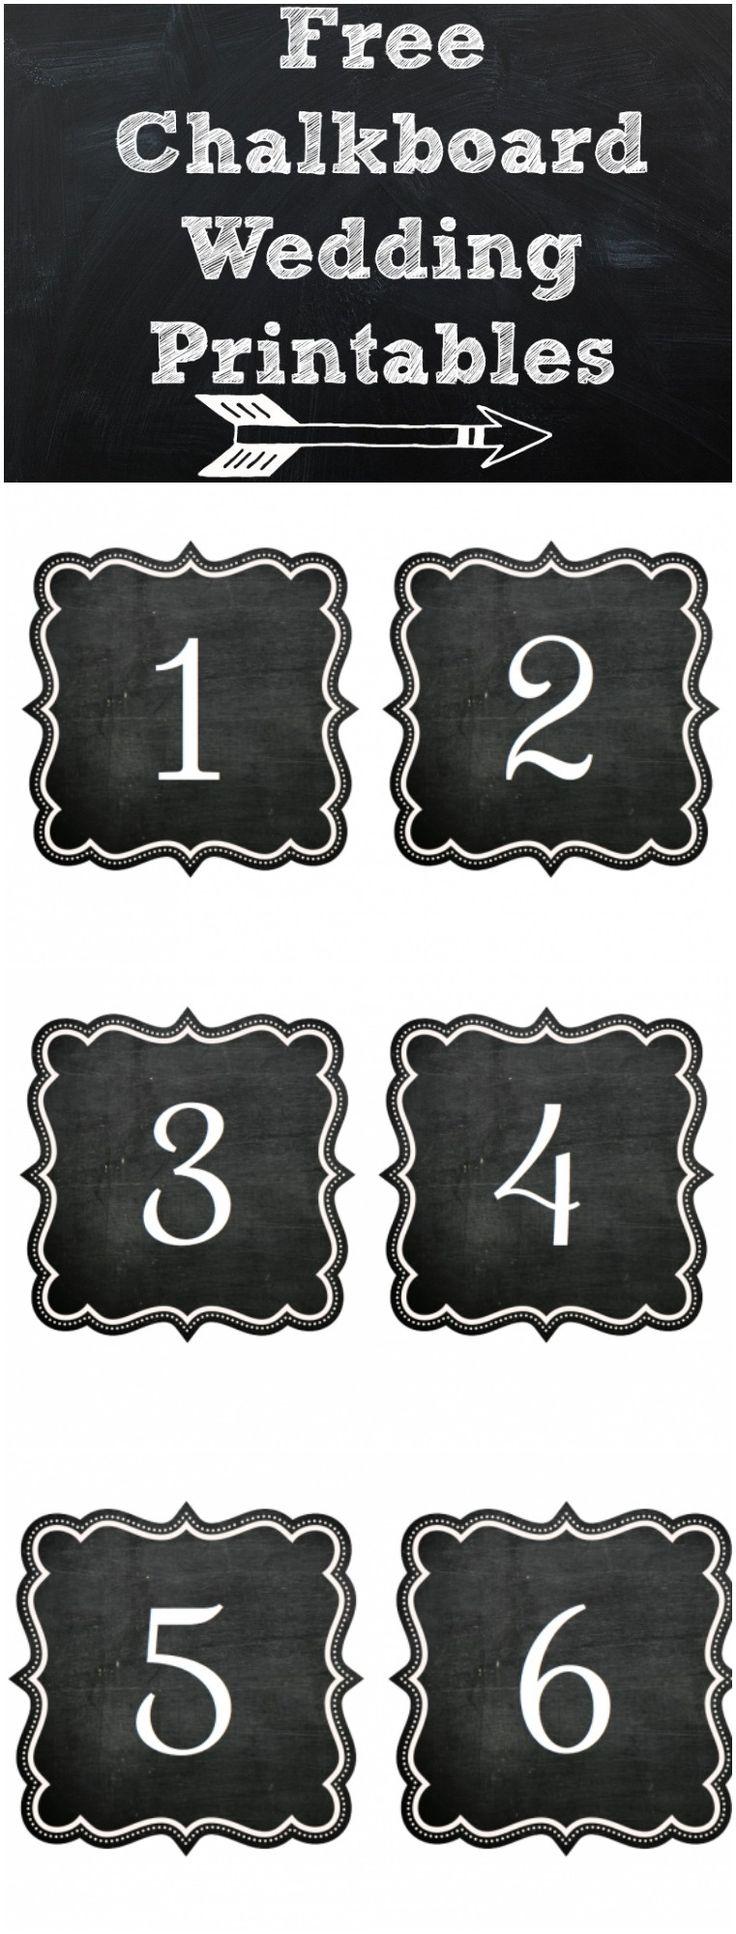 Free Chalkboard Wedding Printables! From rusticweddingchic.com & @Kristin | Paige Simple Studio